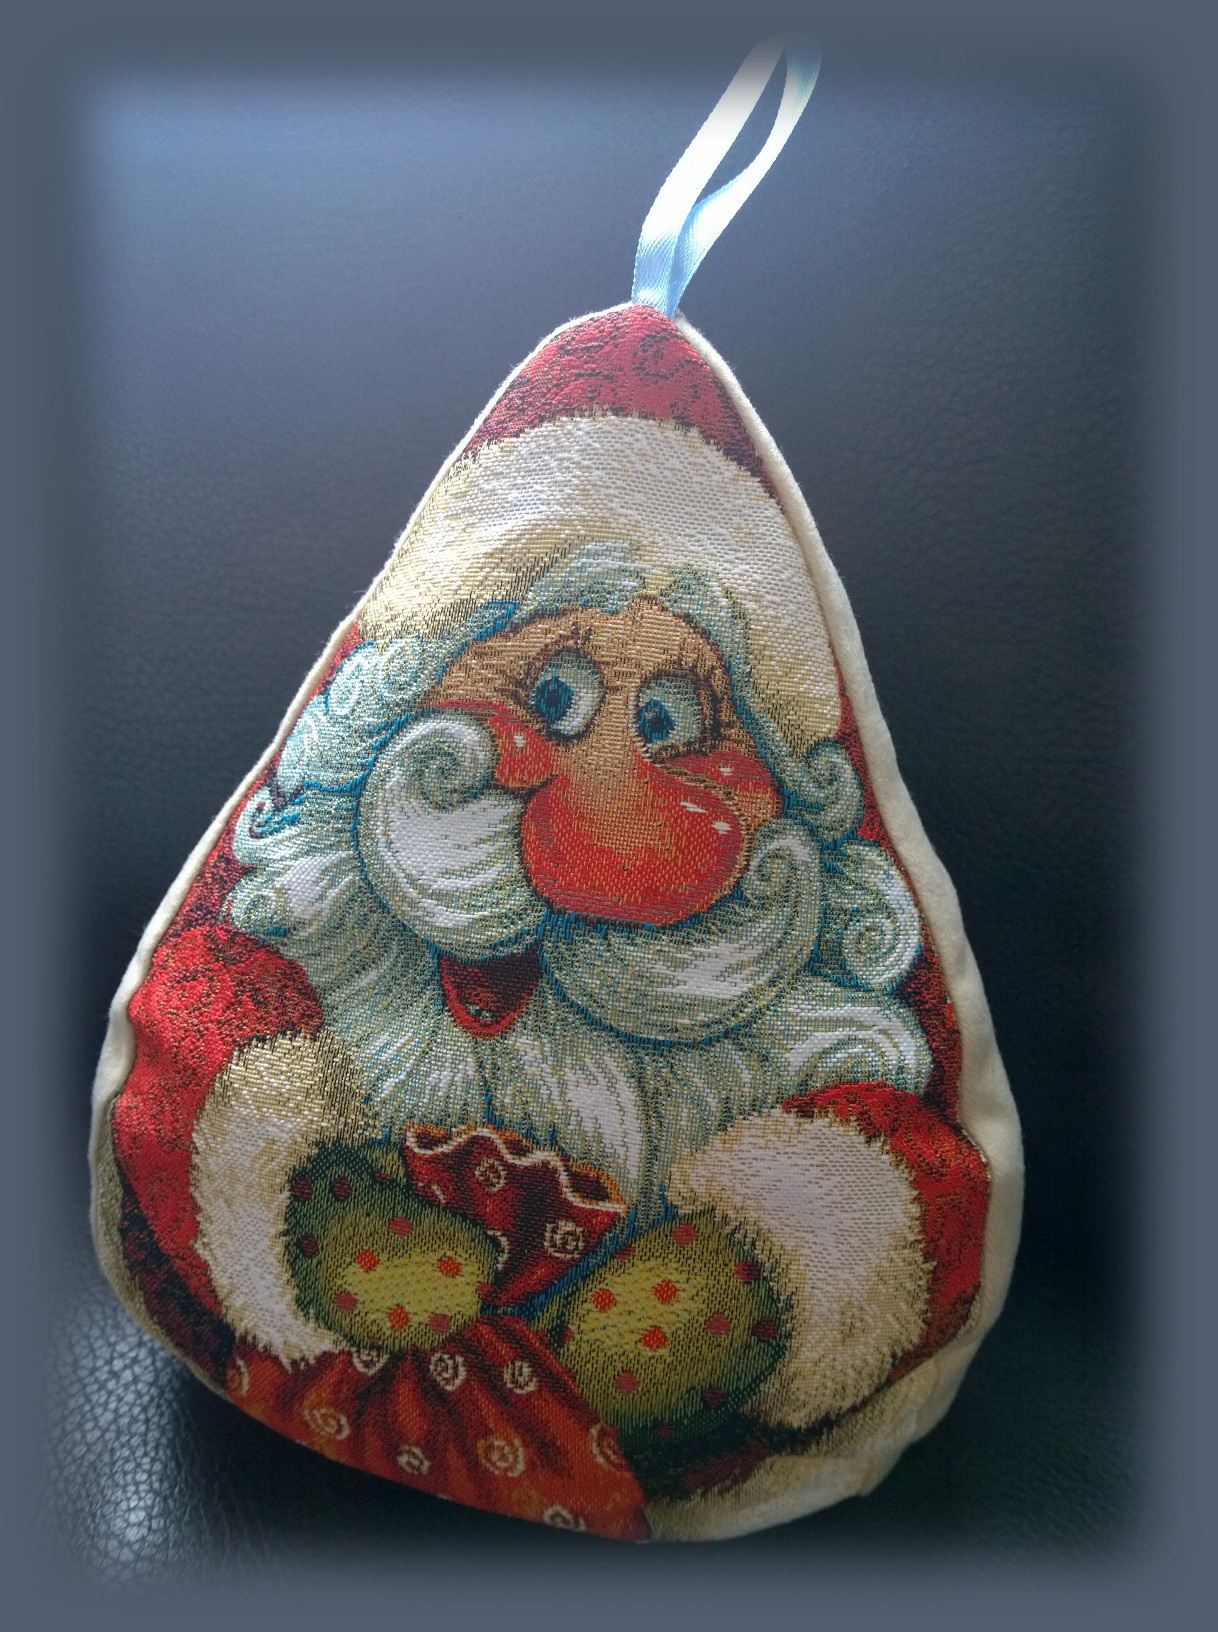 купить гобелен дед мороз для подарка